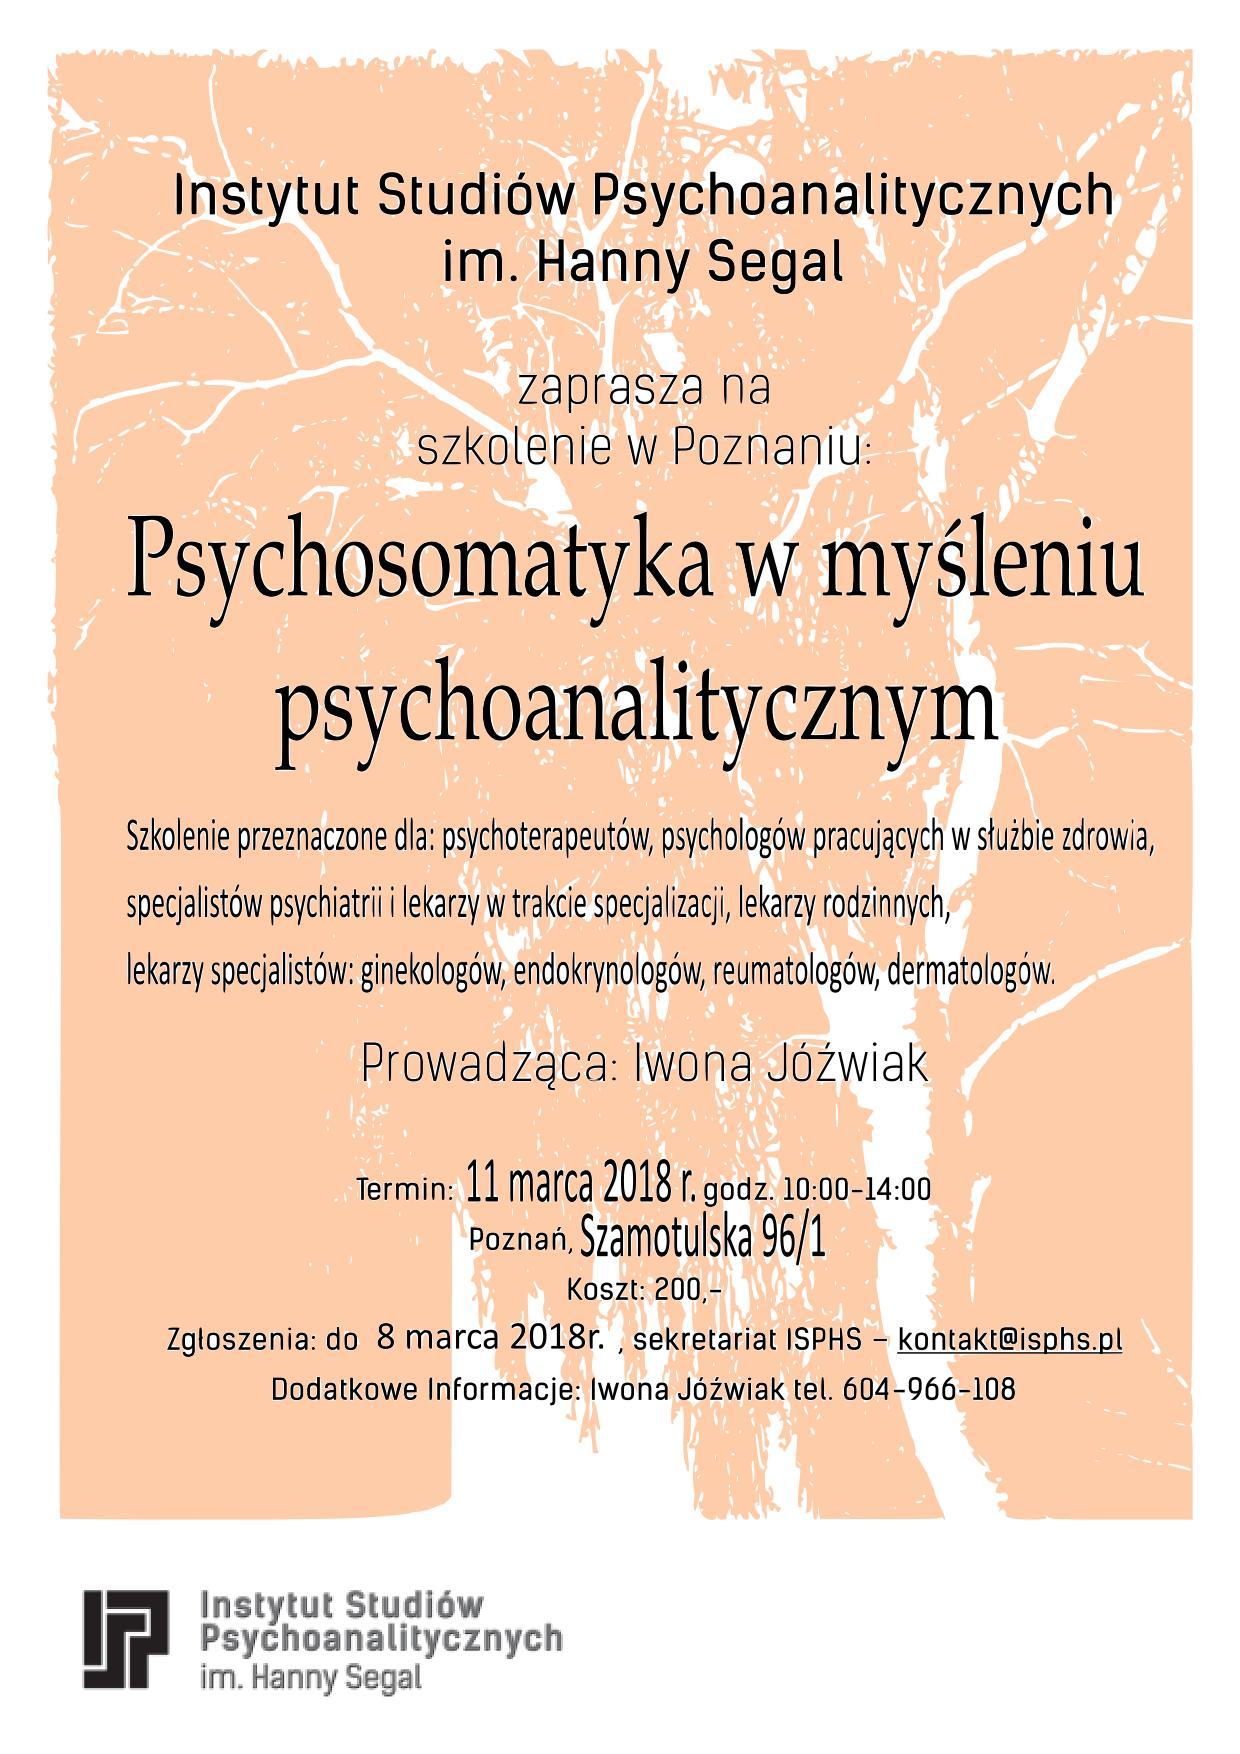 anons IJ psychosom pdf_01jpg